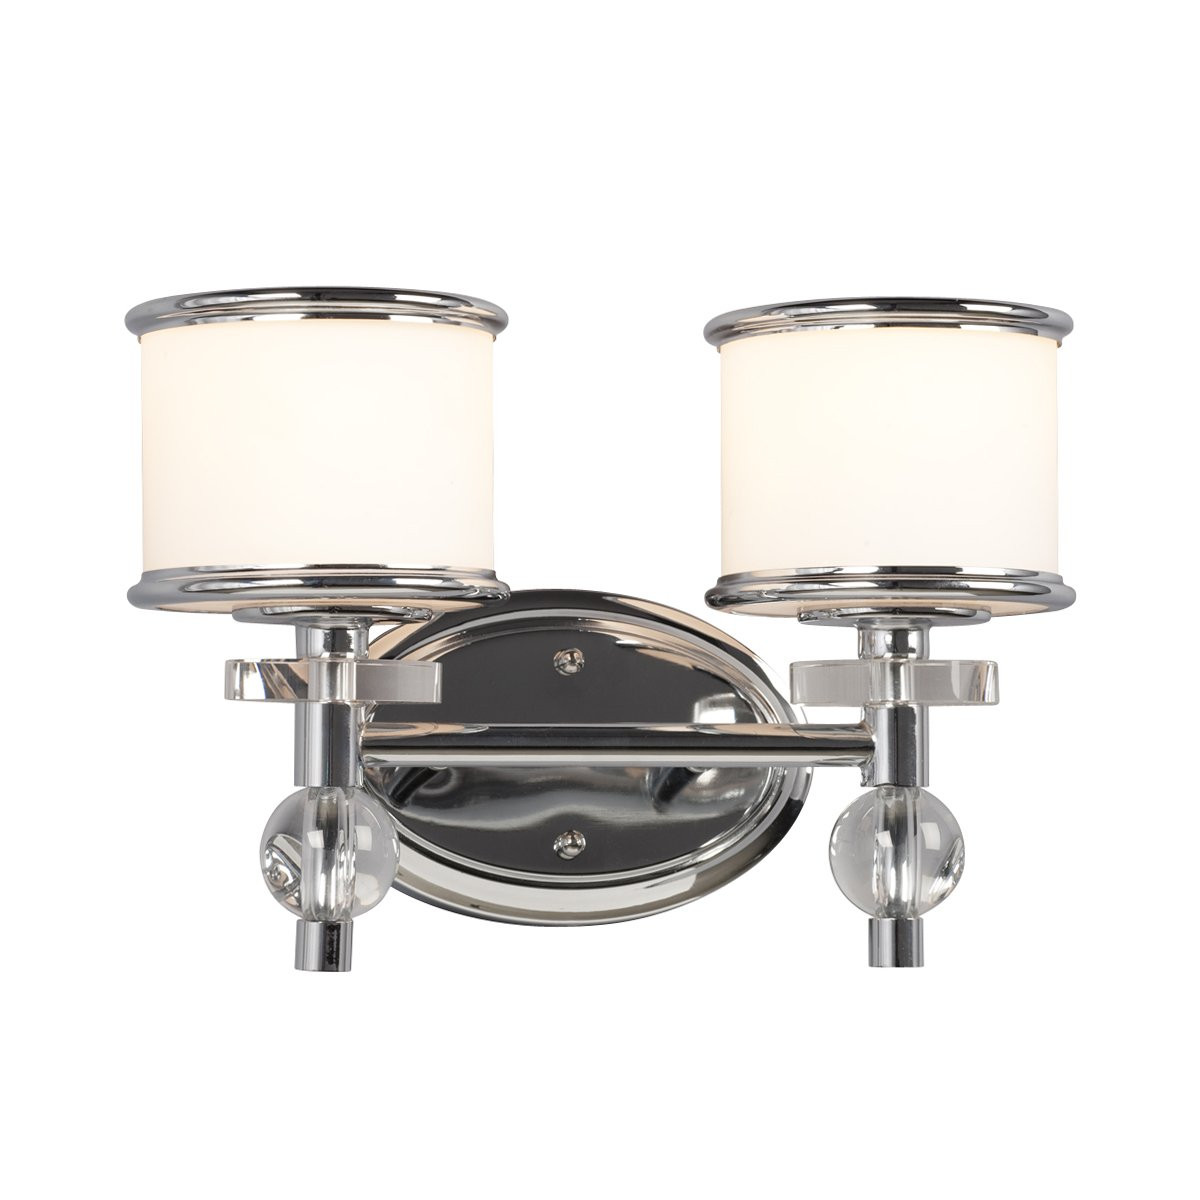 Best ideas about Lowes Bathroom Lighting . Save or Pin Galaxy Lighting Hilton 2 Light Bathroom Vanity Now.